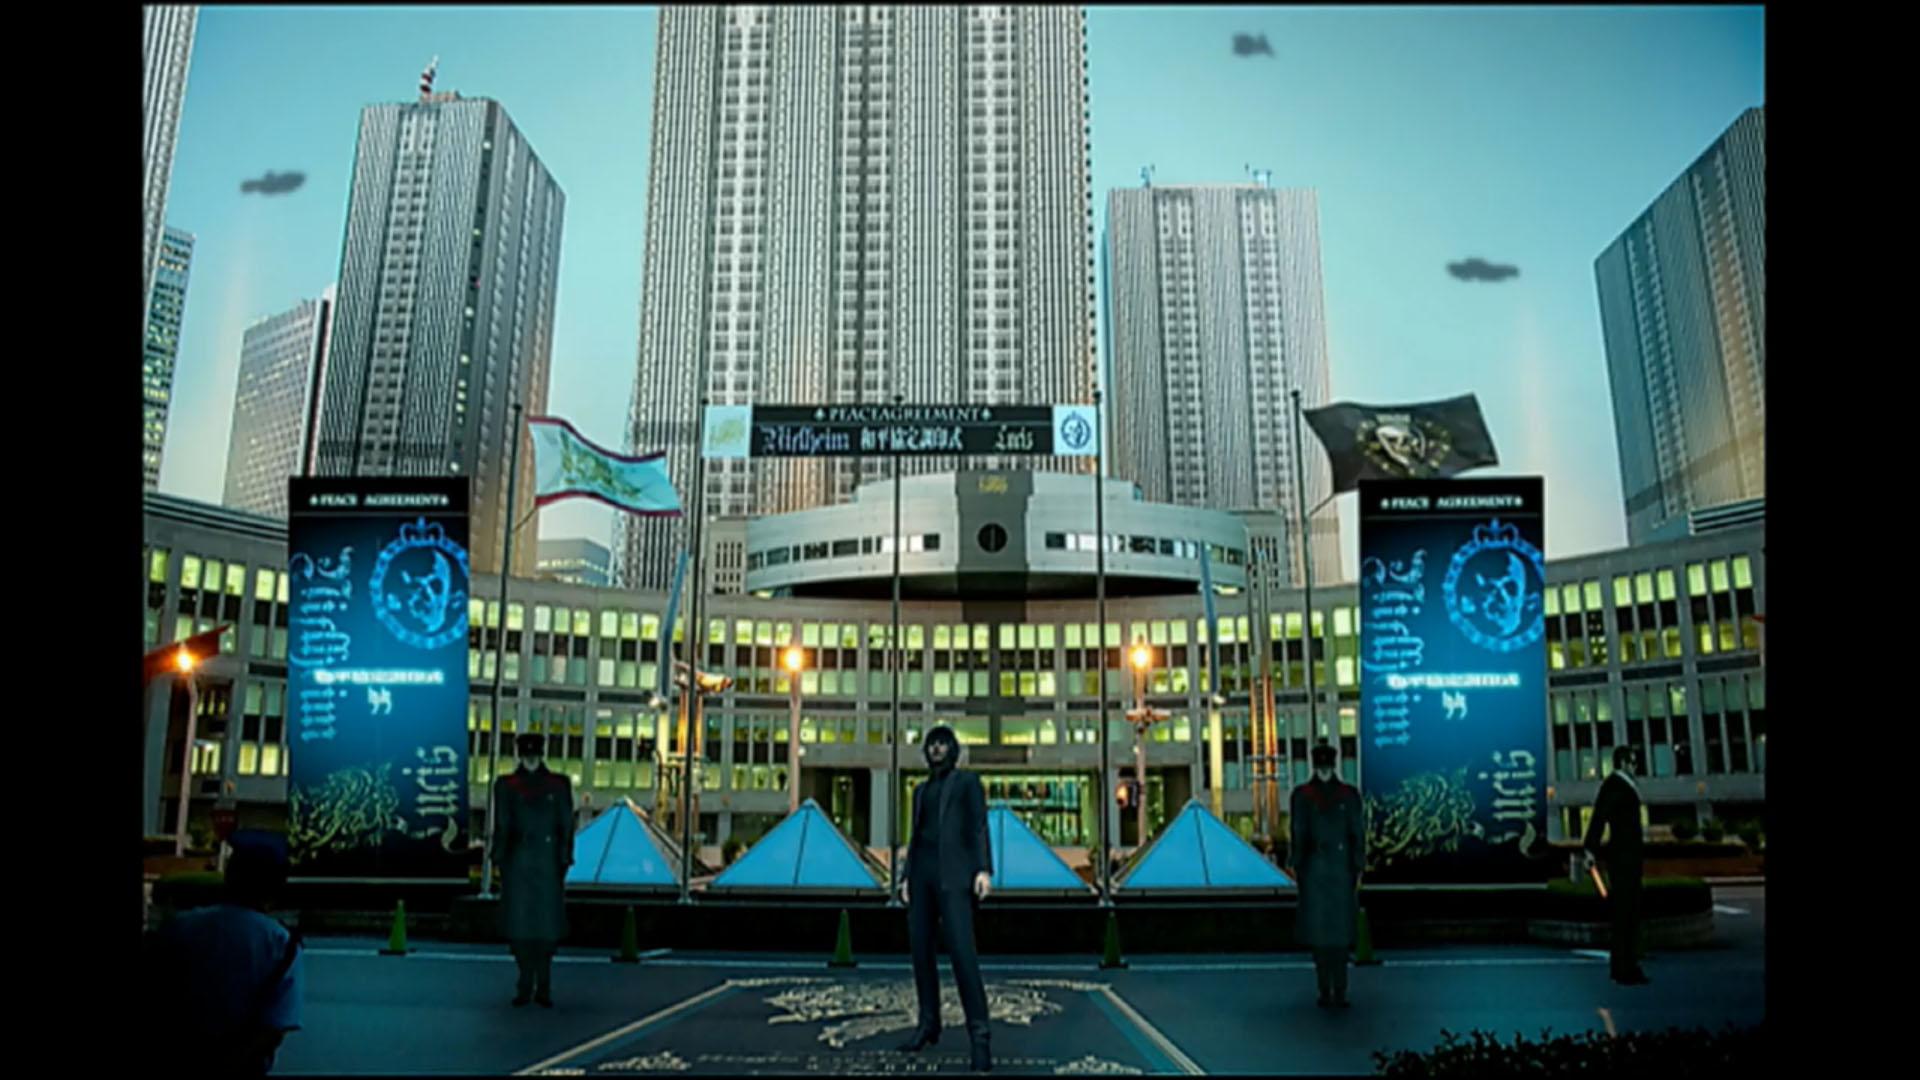 Girls Und Panzer Wallpaper Final Fantasy Xv S Modern City Artwork Showcased During